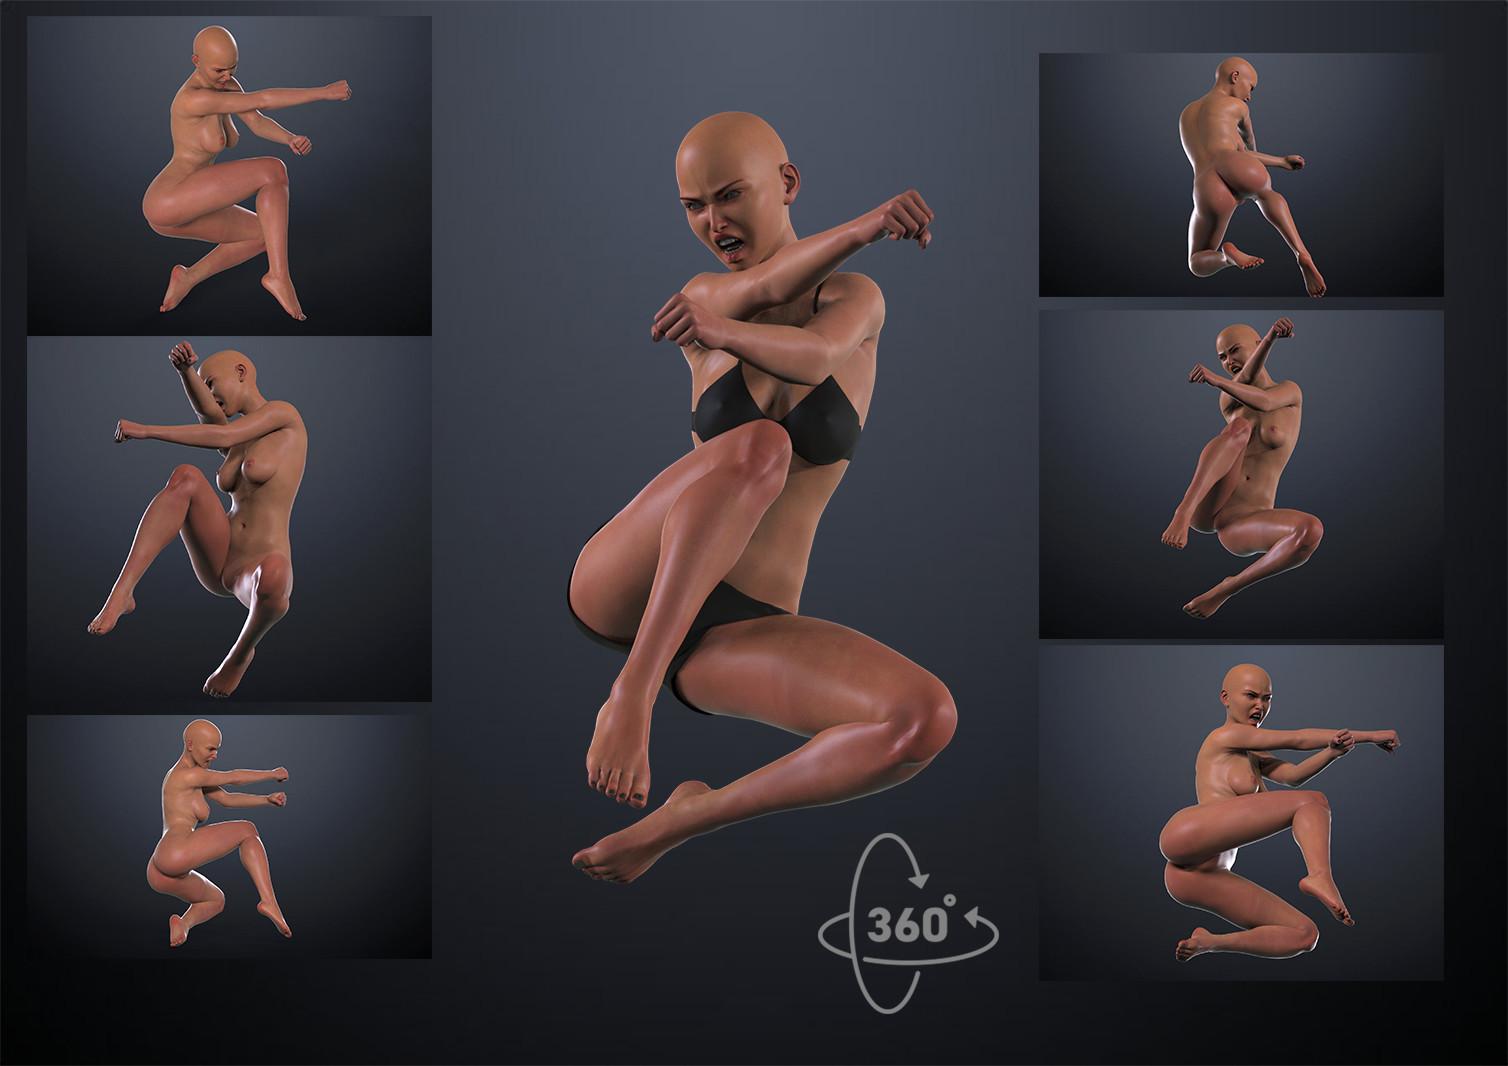 ArtStation - Female Pose Reference, Inspiring References